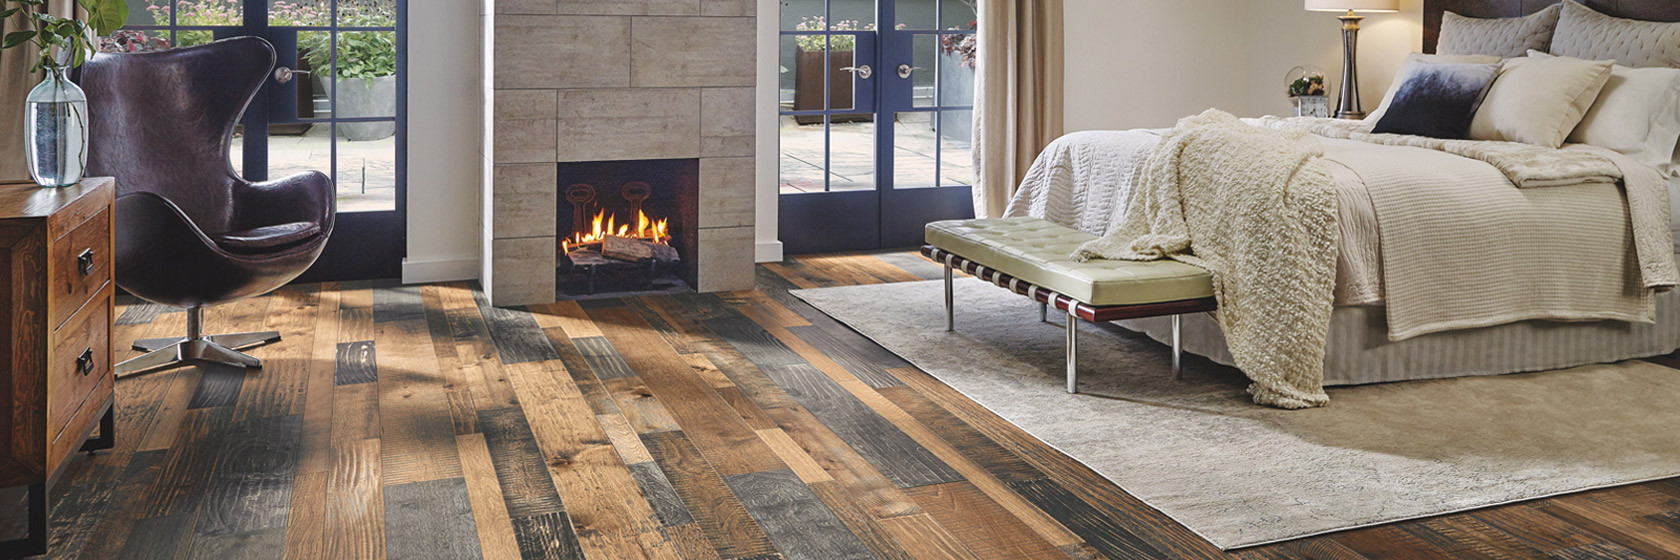 timberland hardwood floors omaha of hardwood flooring armstrong flooring residential inside woodland relics